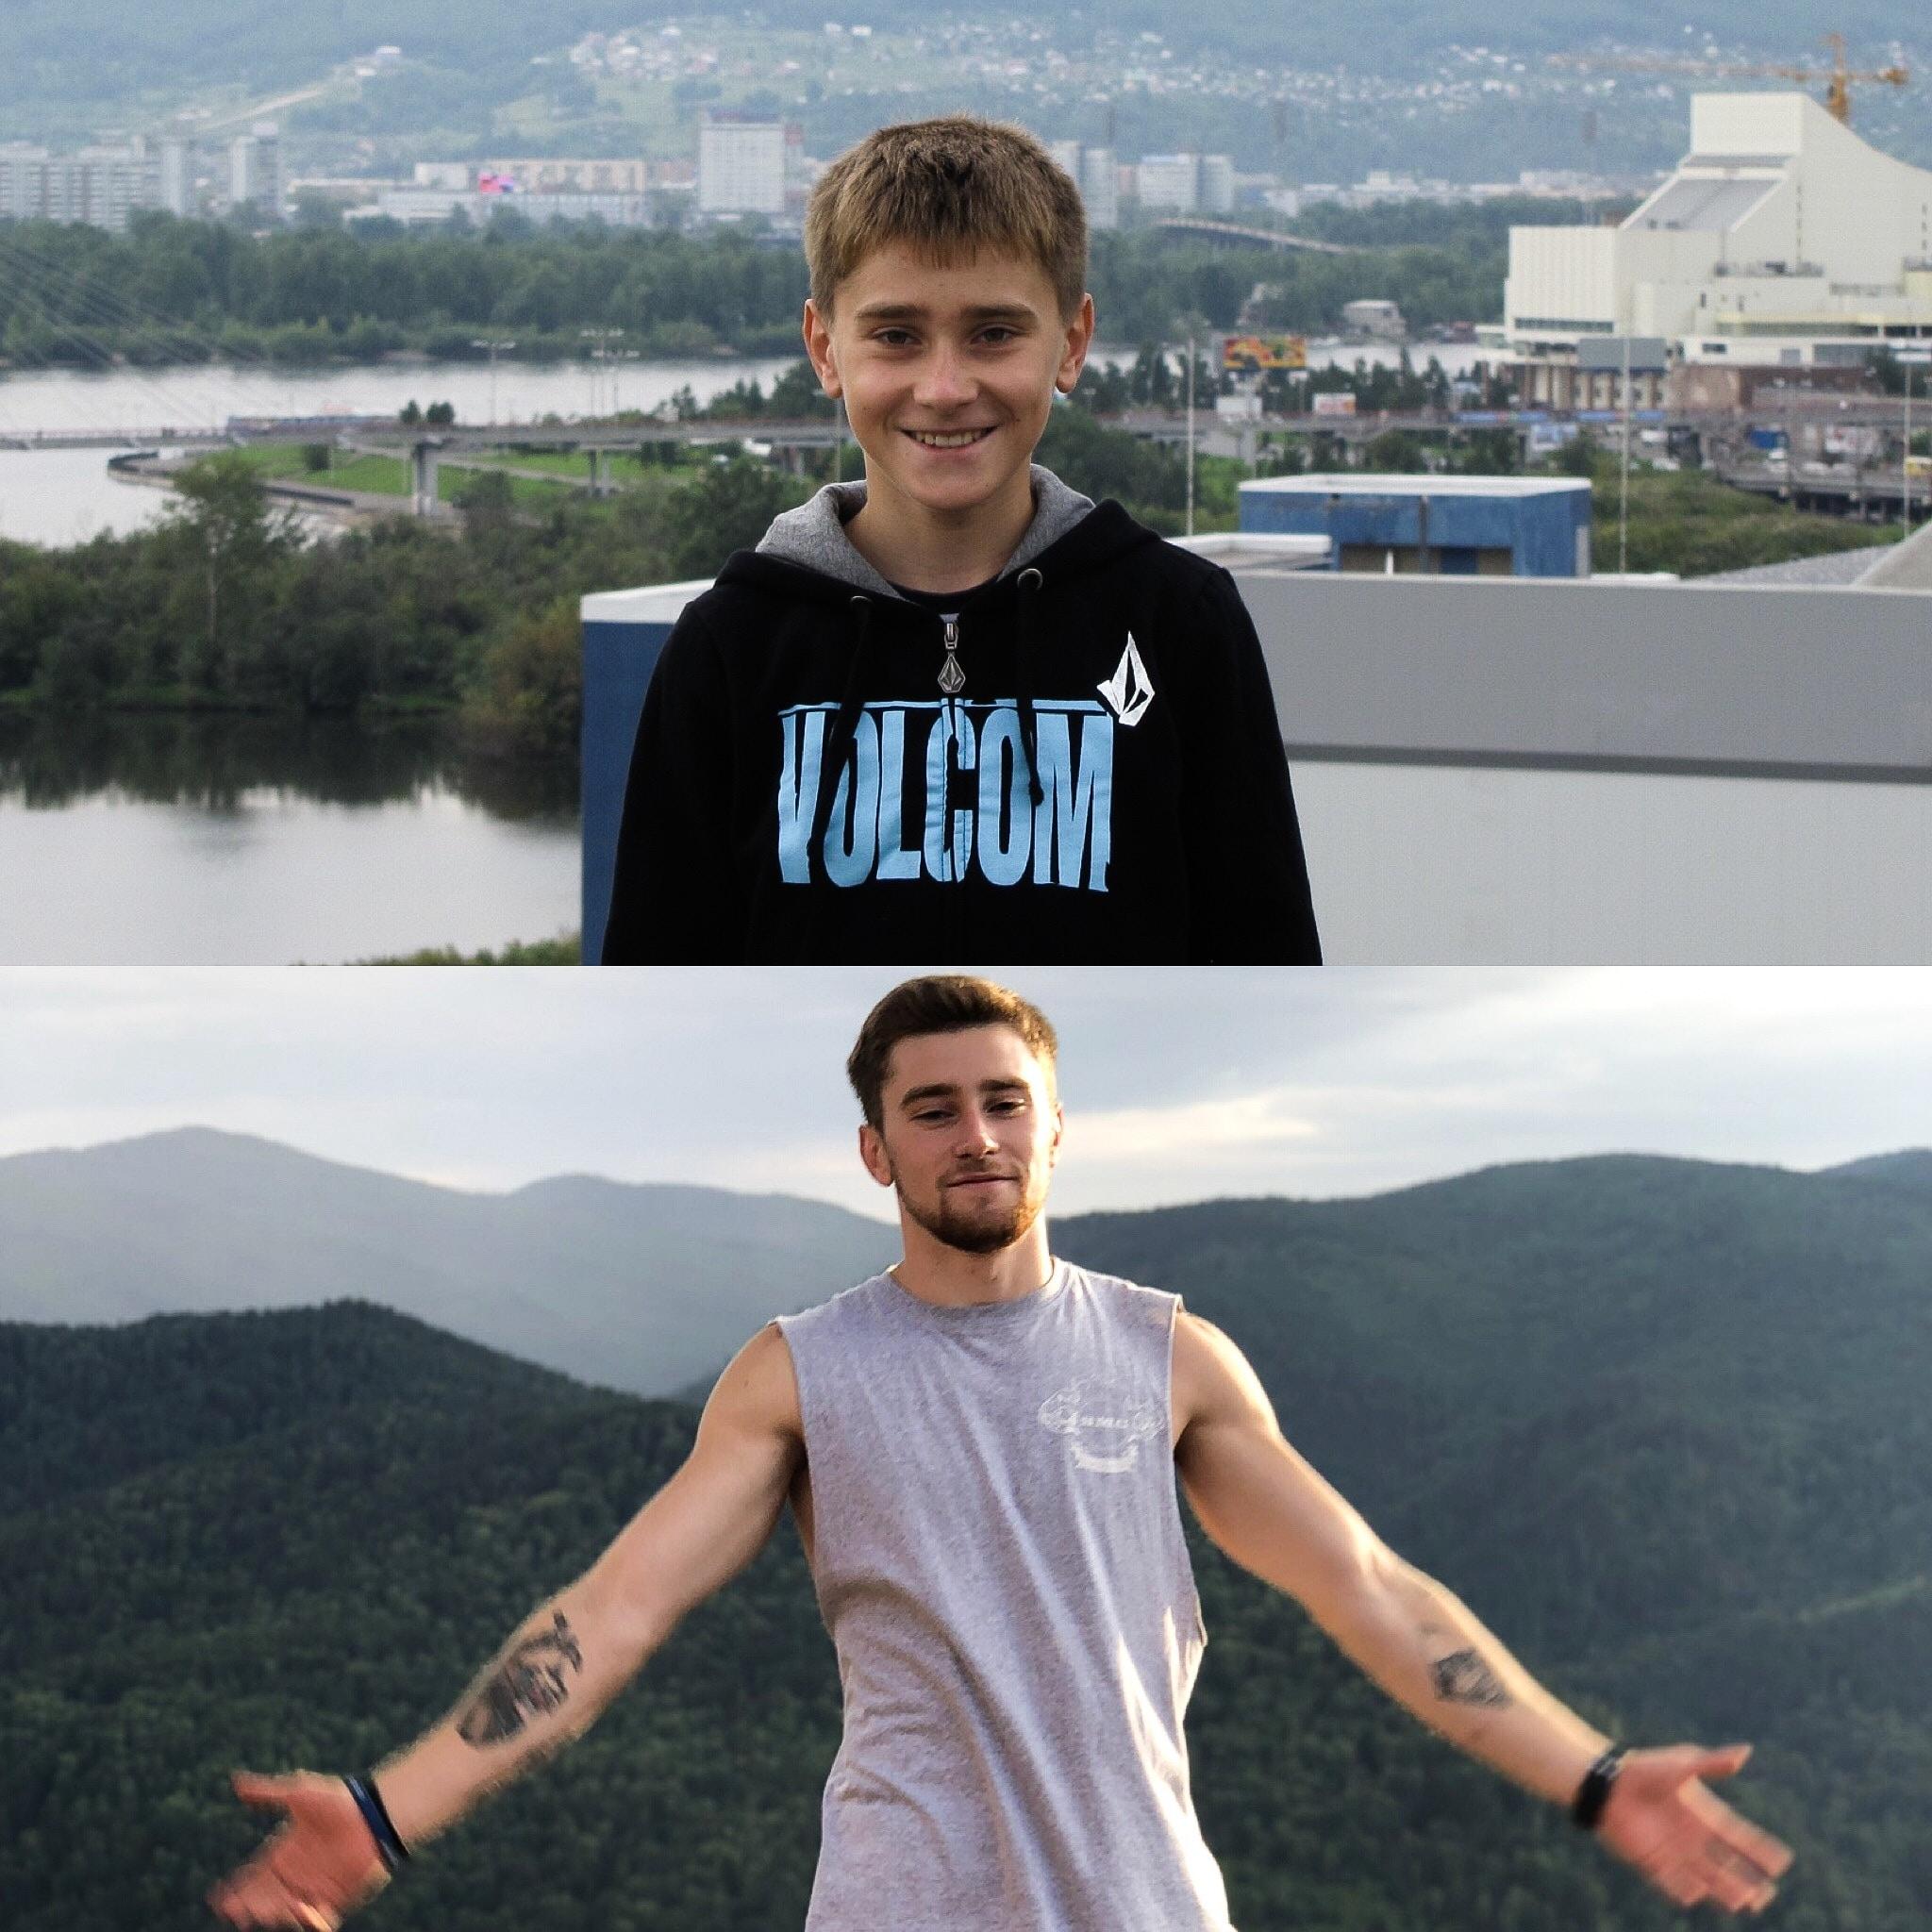 Go to kirill shevchuk's profile